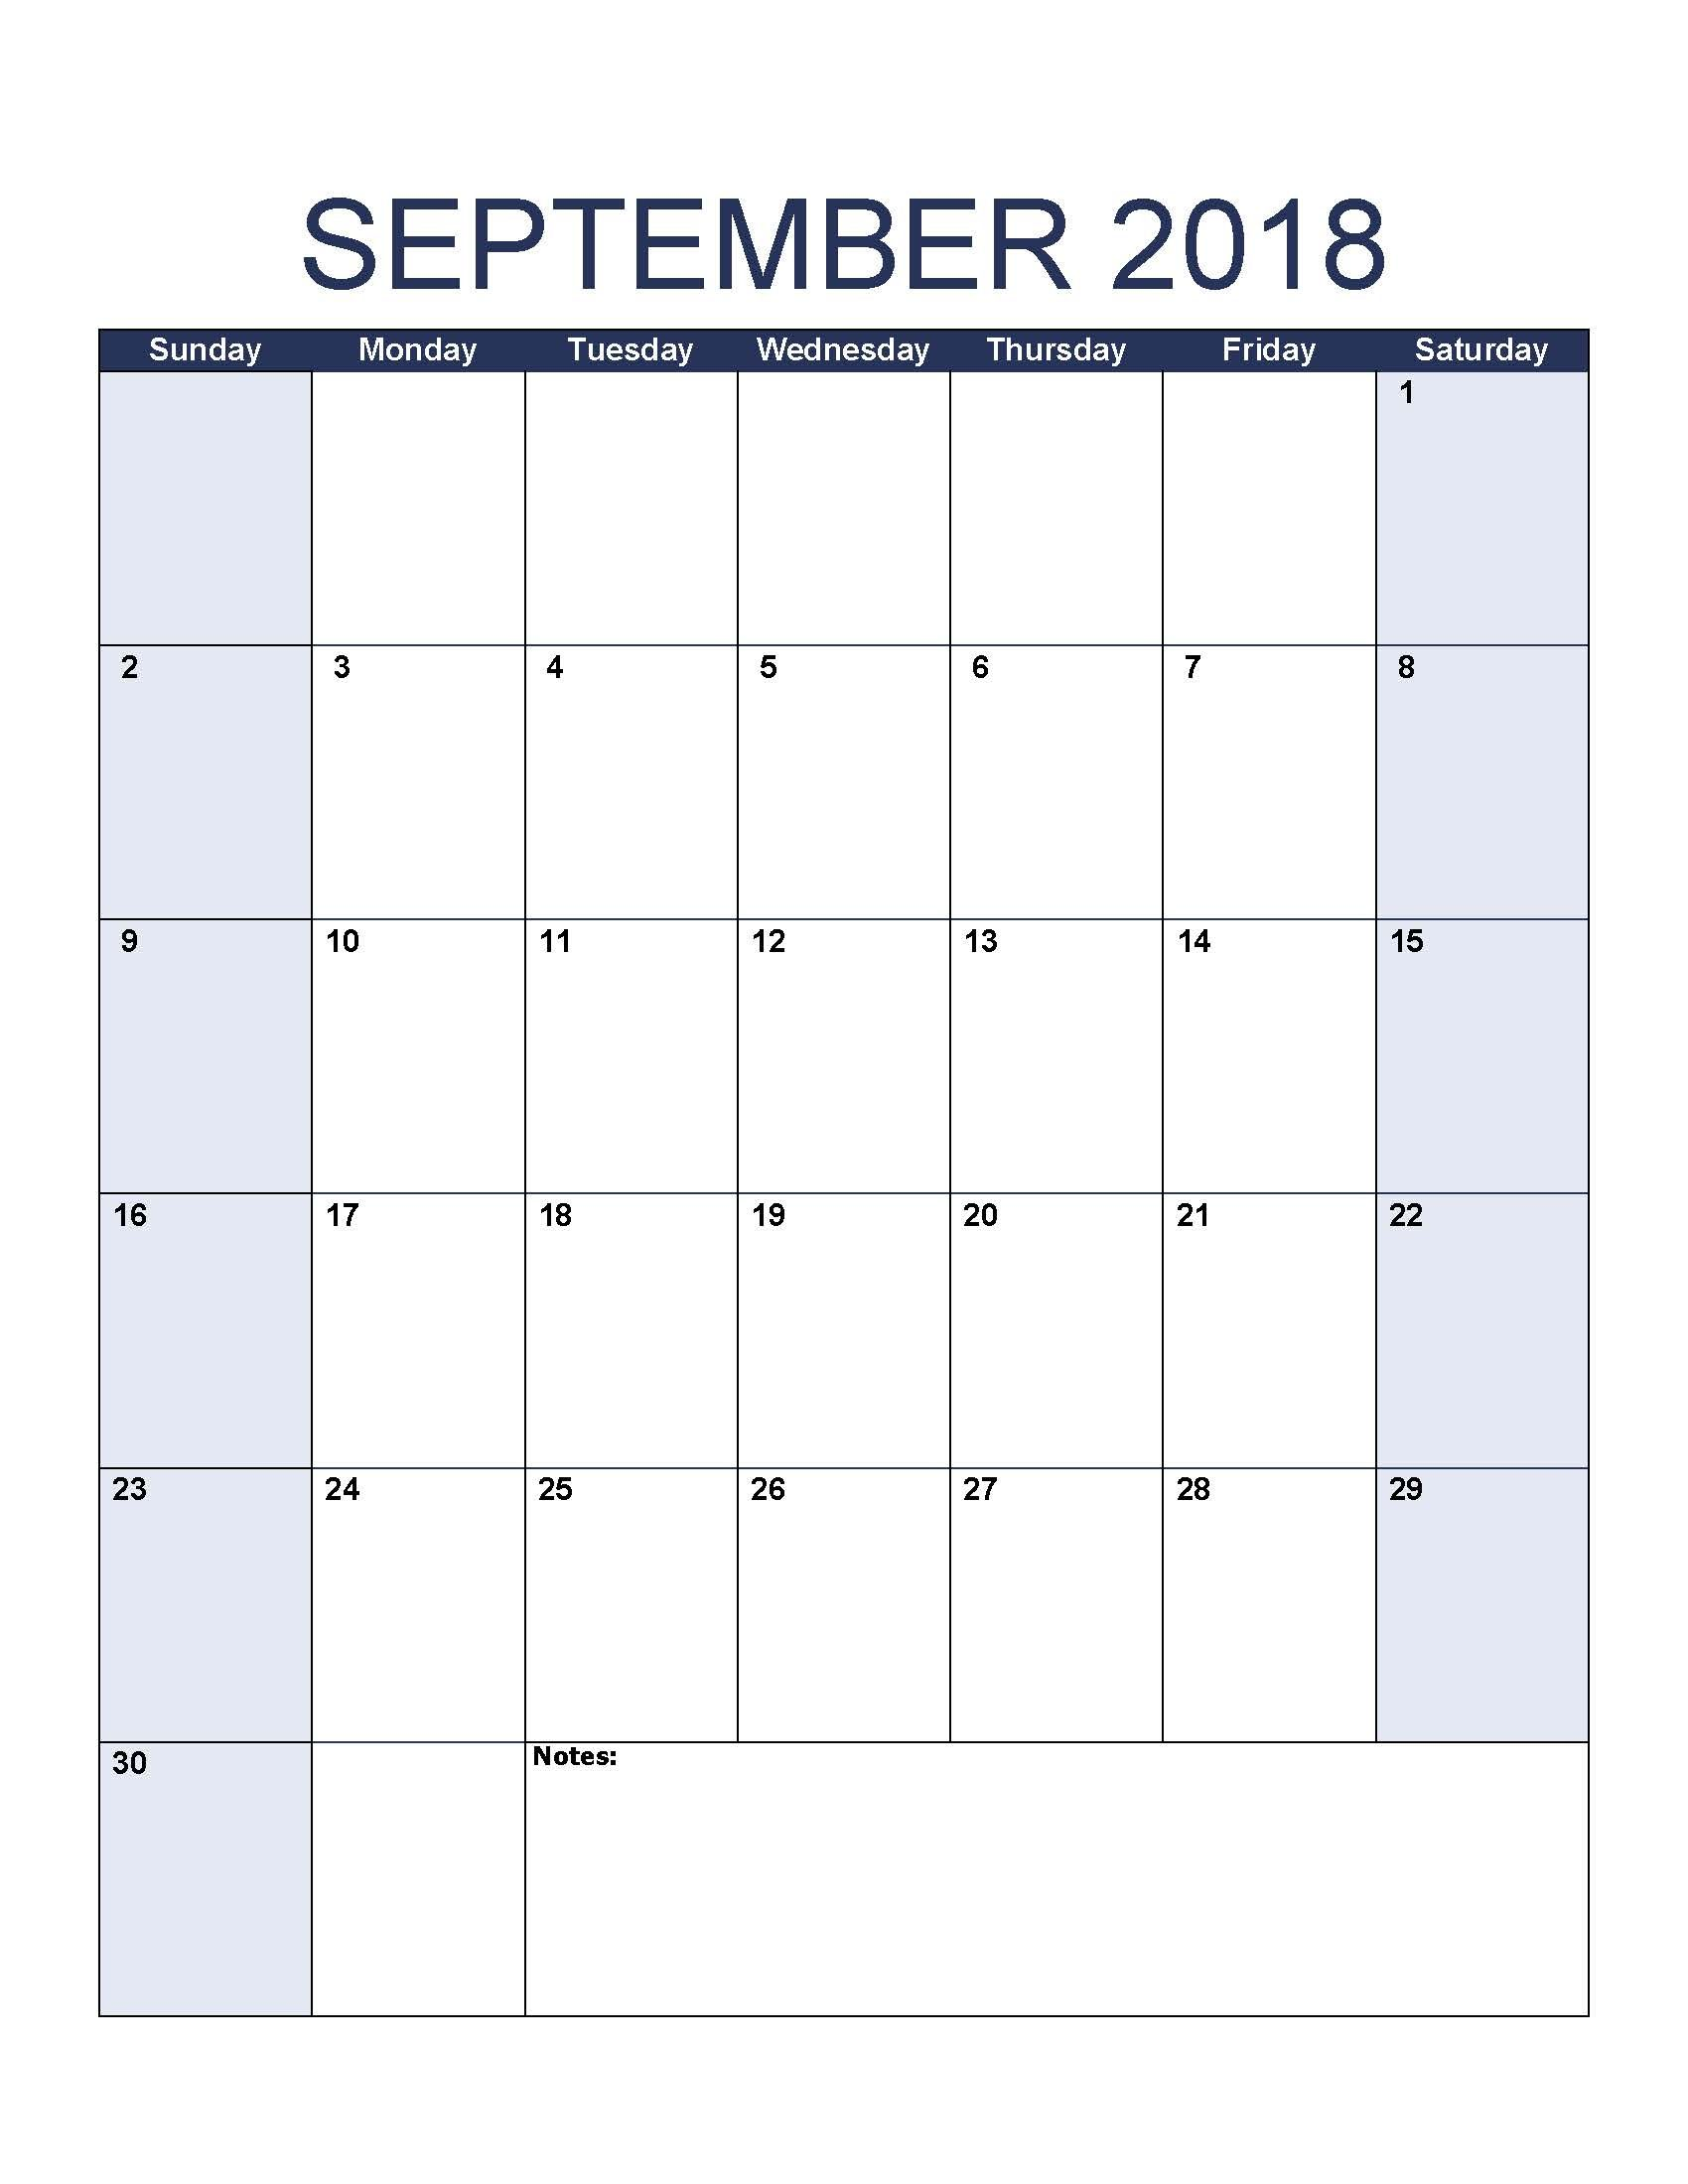 Blank September 2018 Calendar Download Printable September 2018